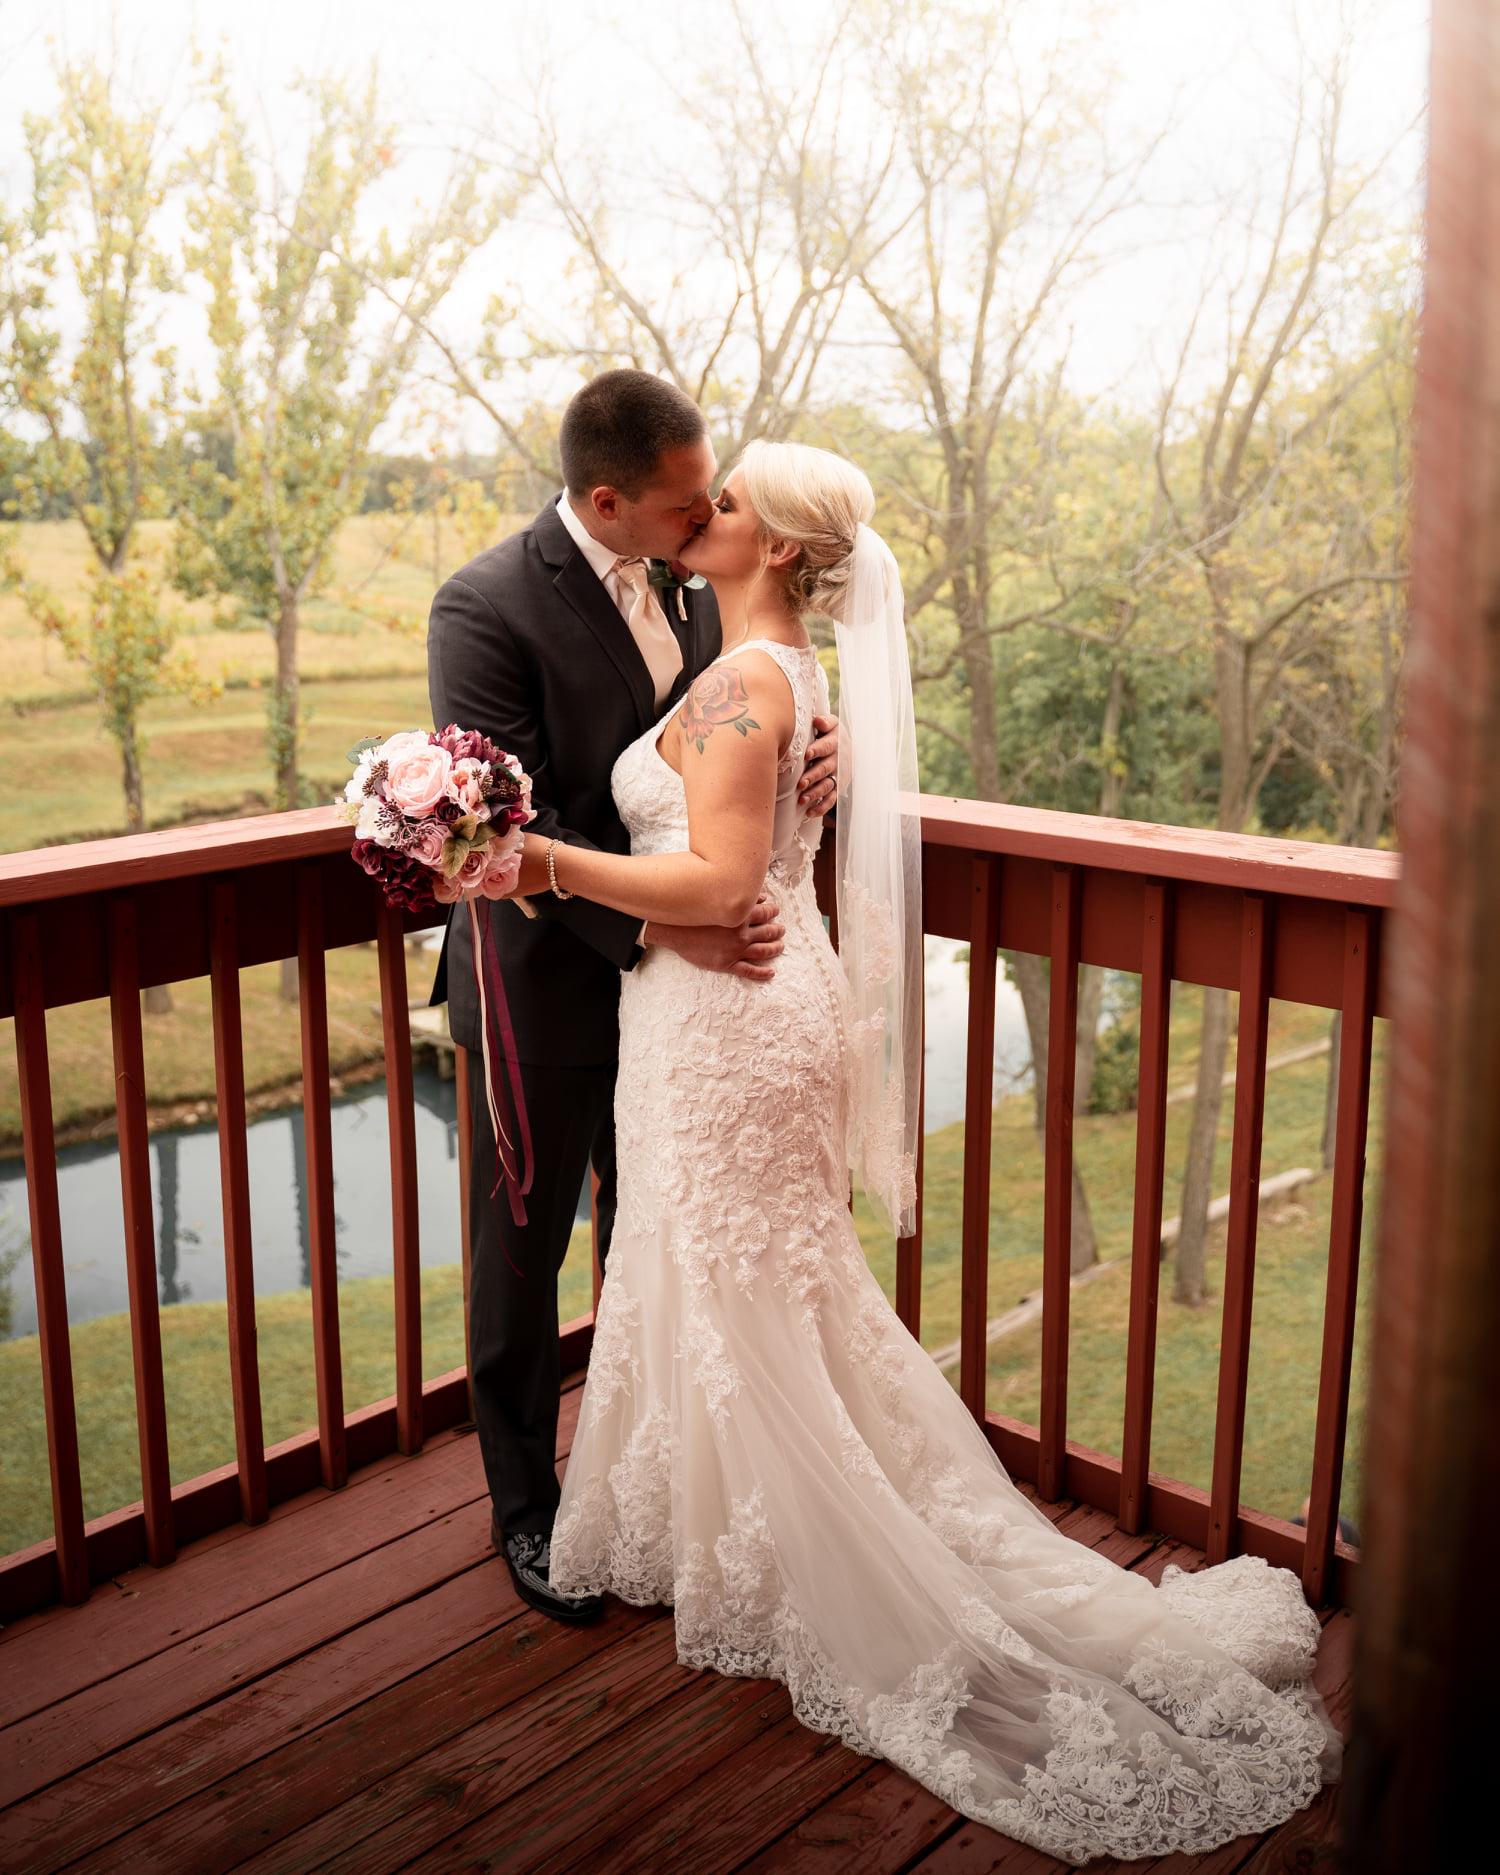 Couple on balcony kiss